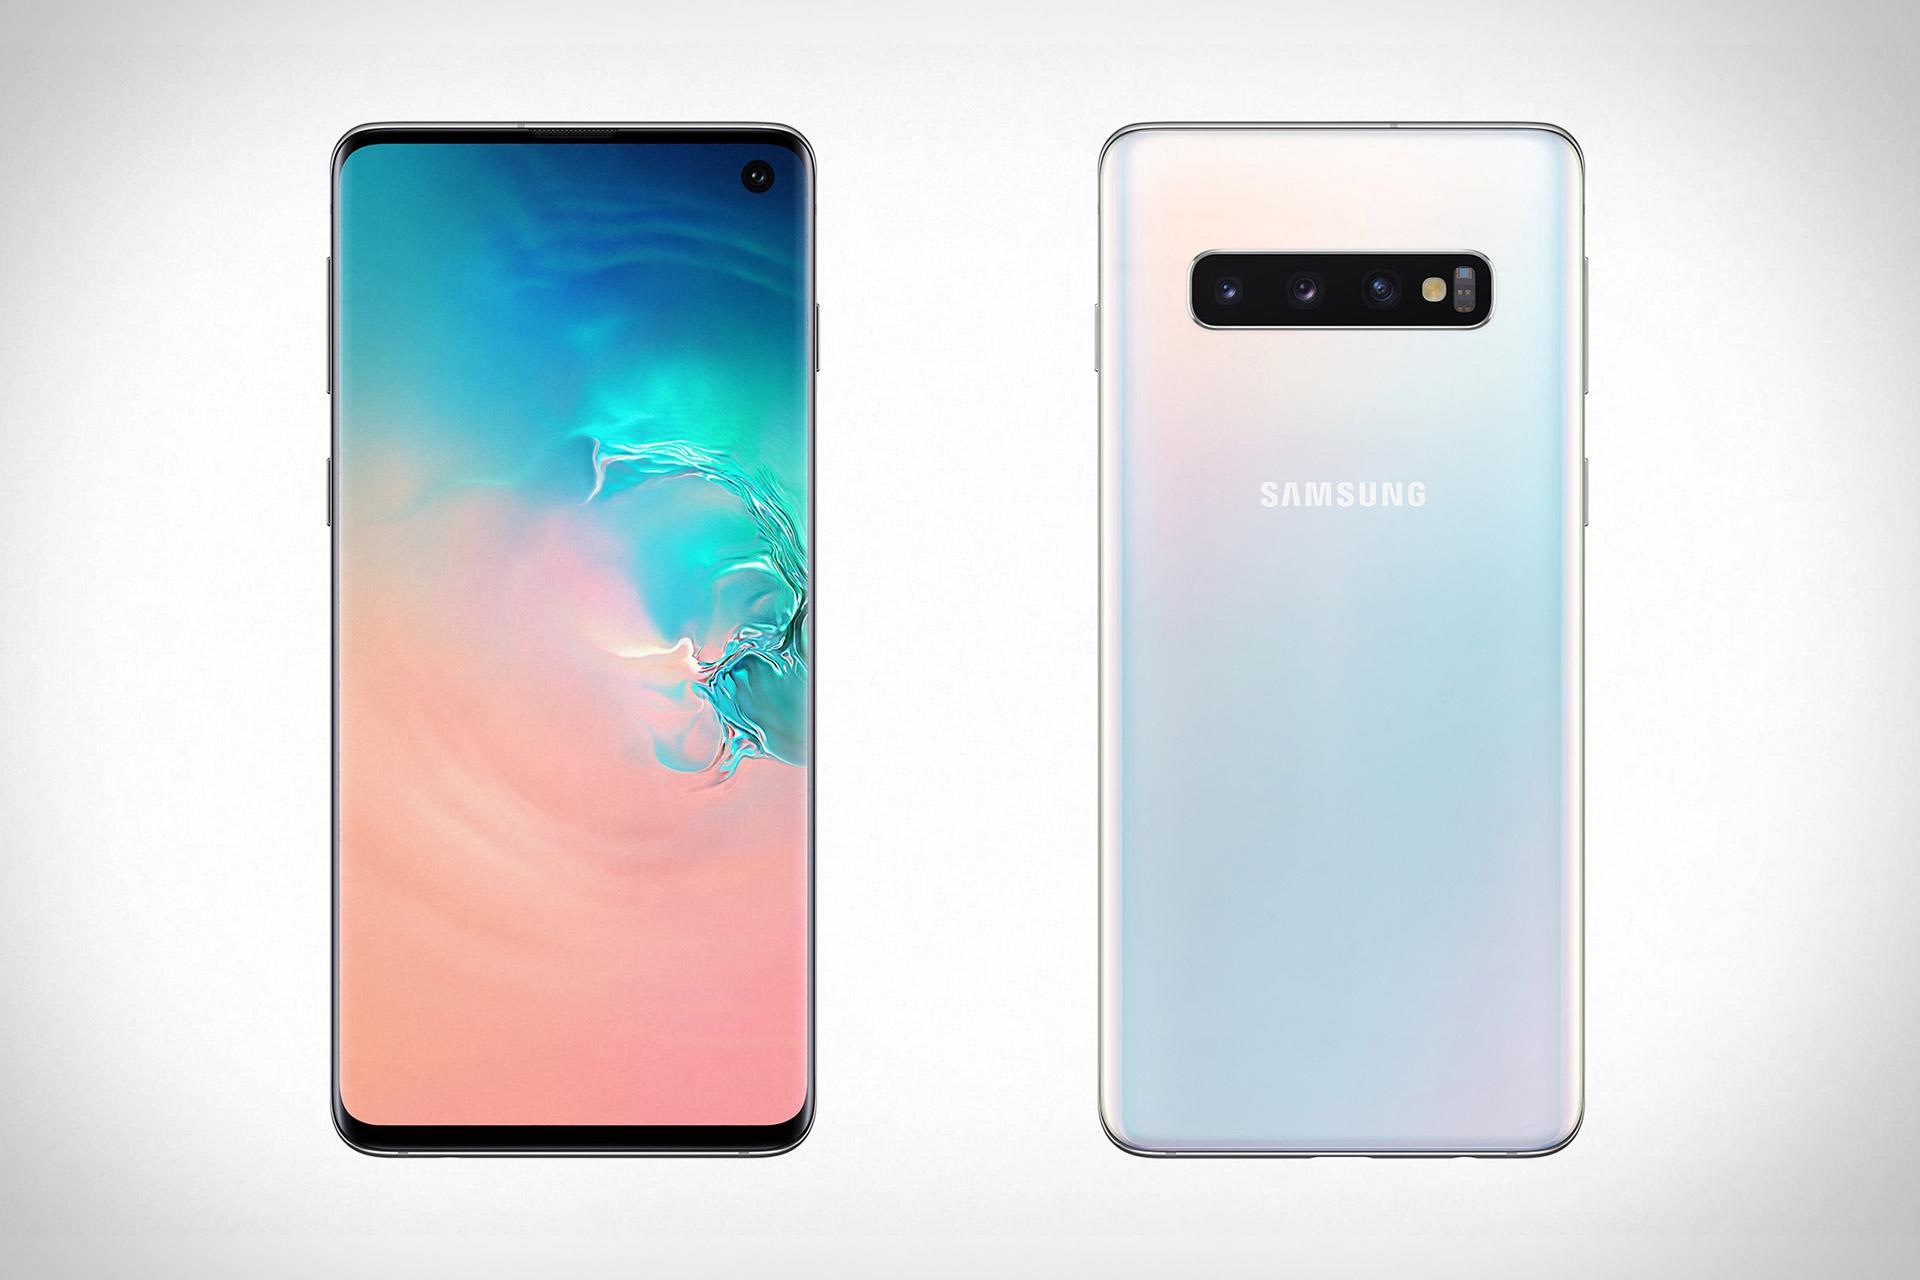 Samsung Galaxy S10 Smartphone | Uncrate